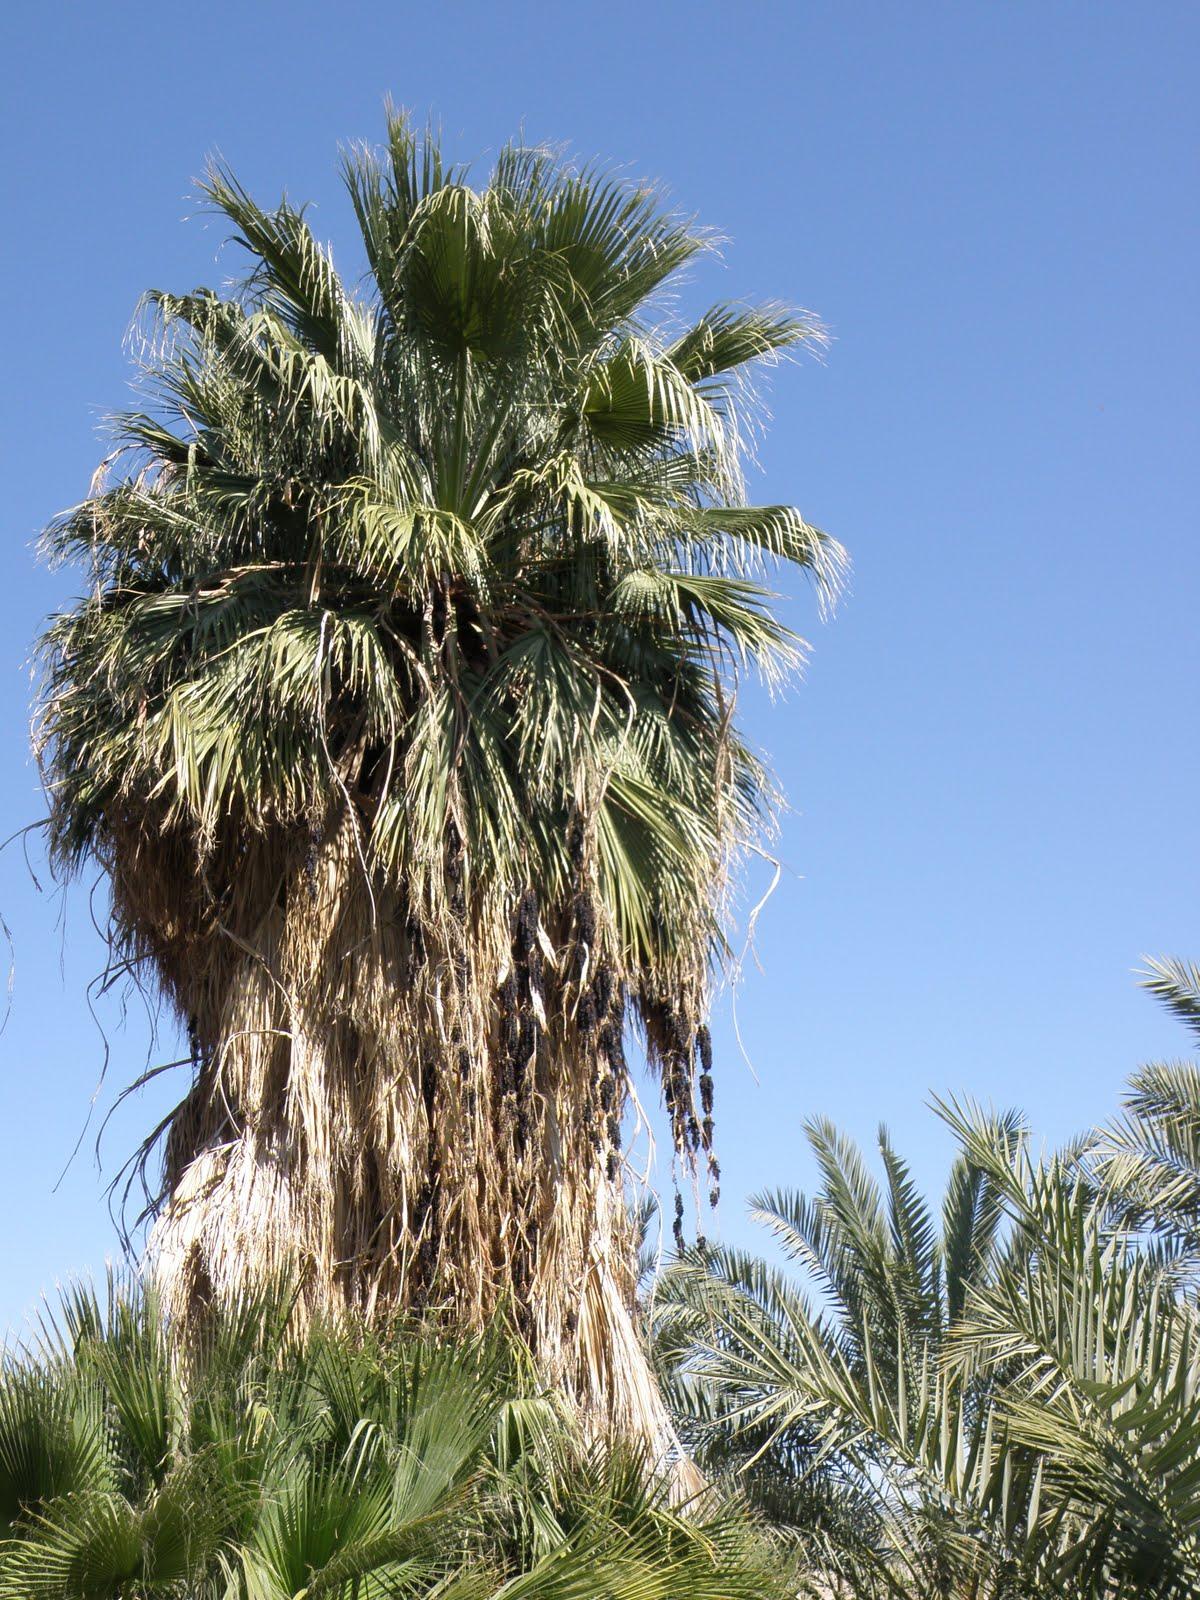 The Hive Palm Beach Louis Sherry